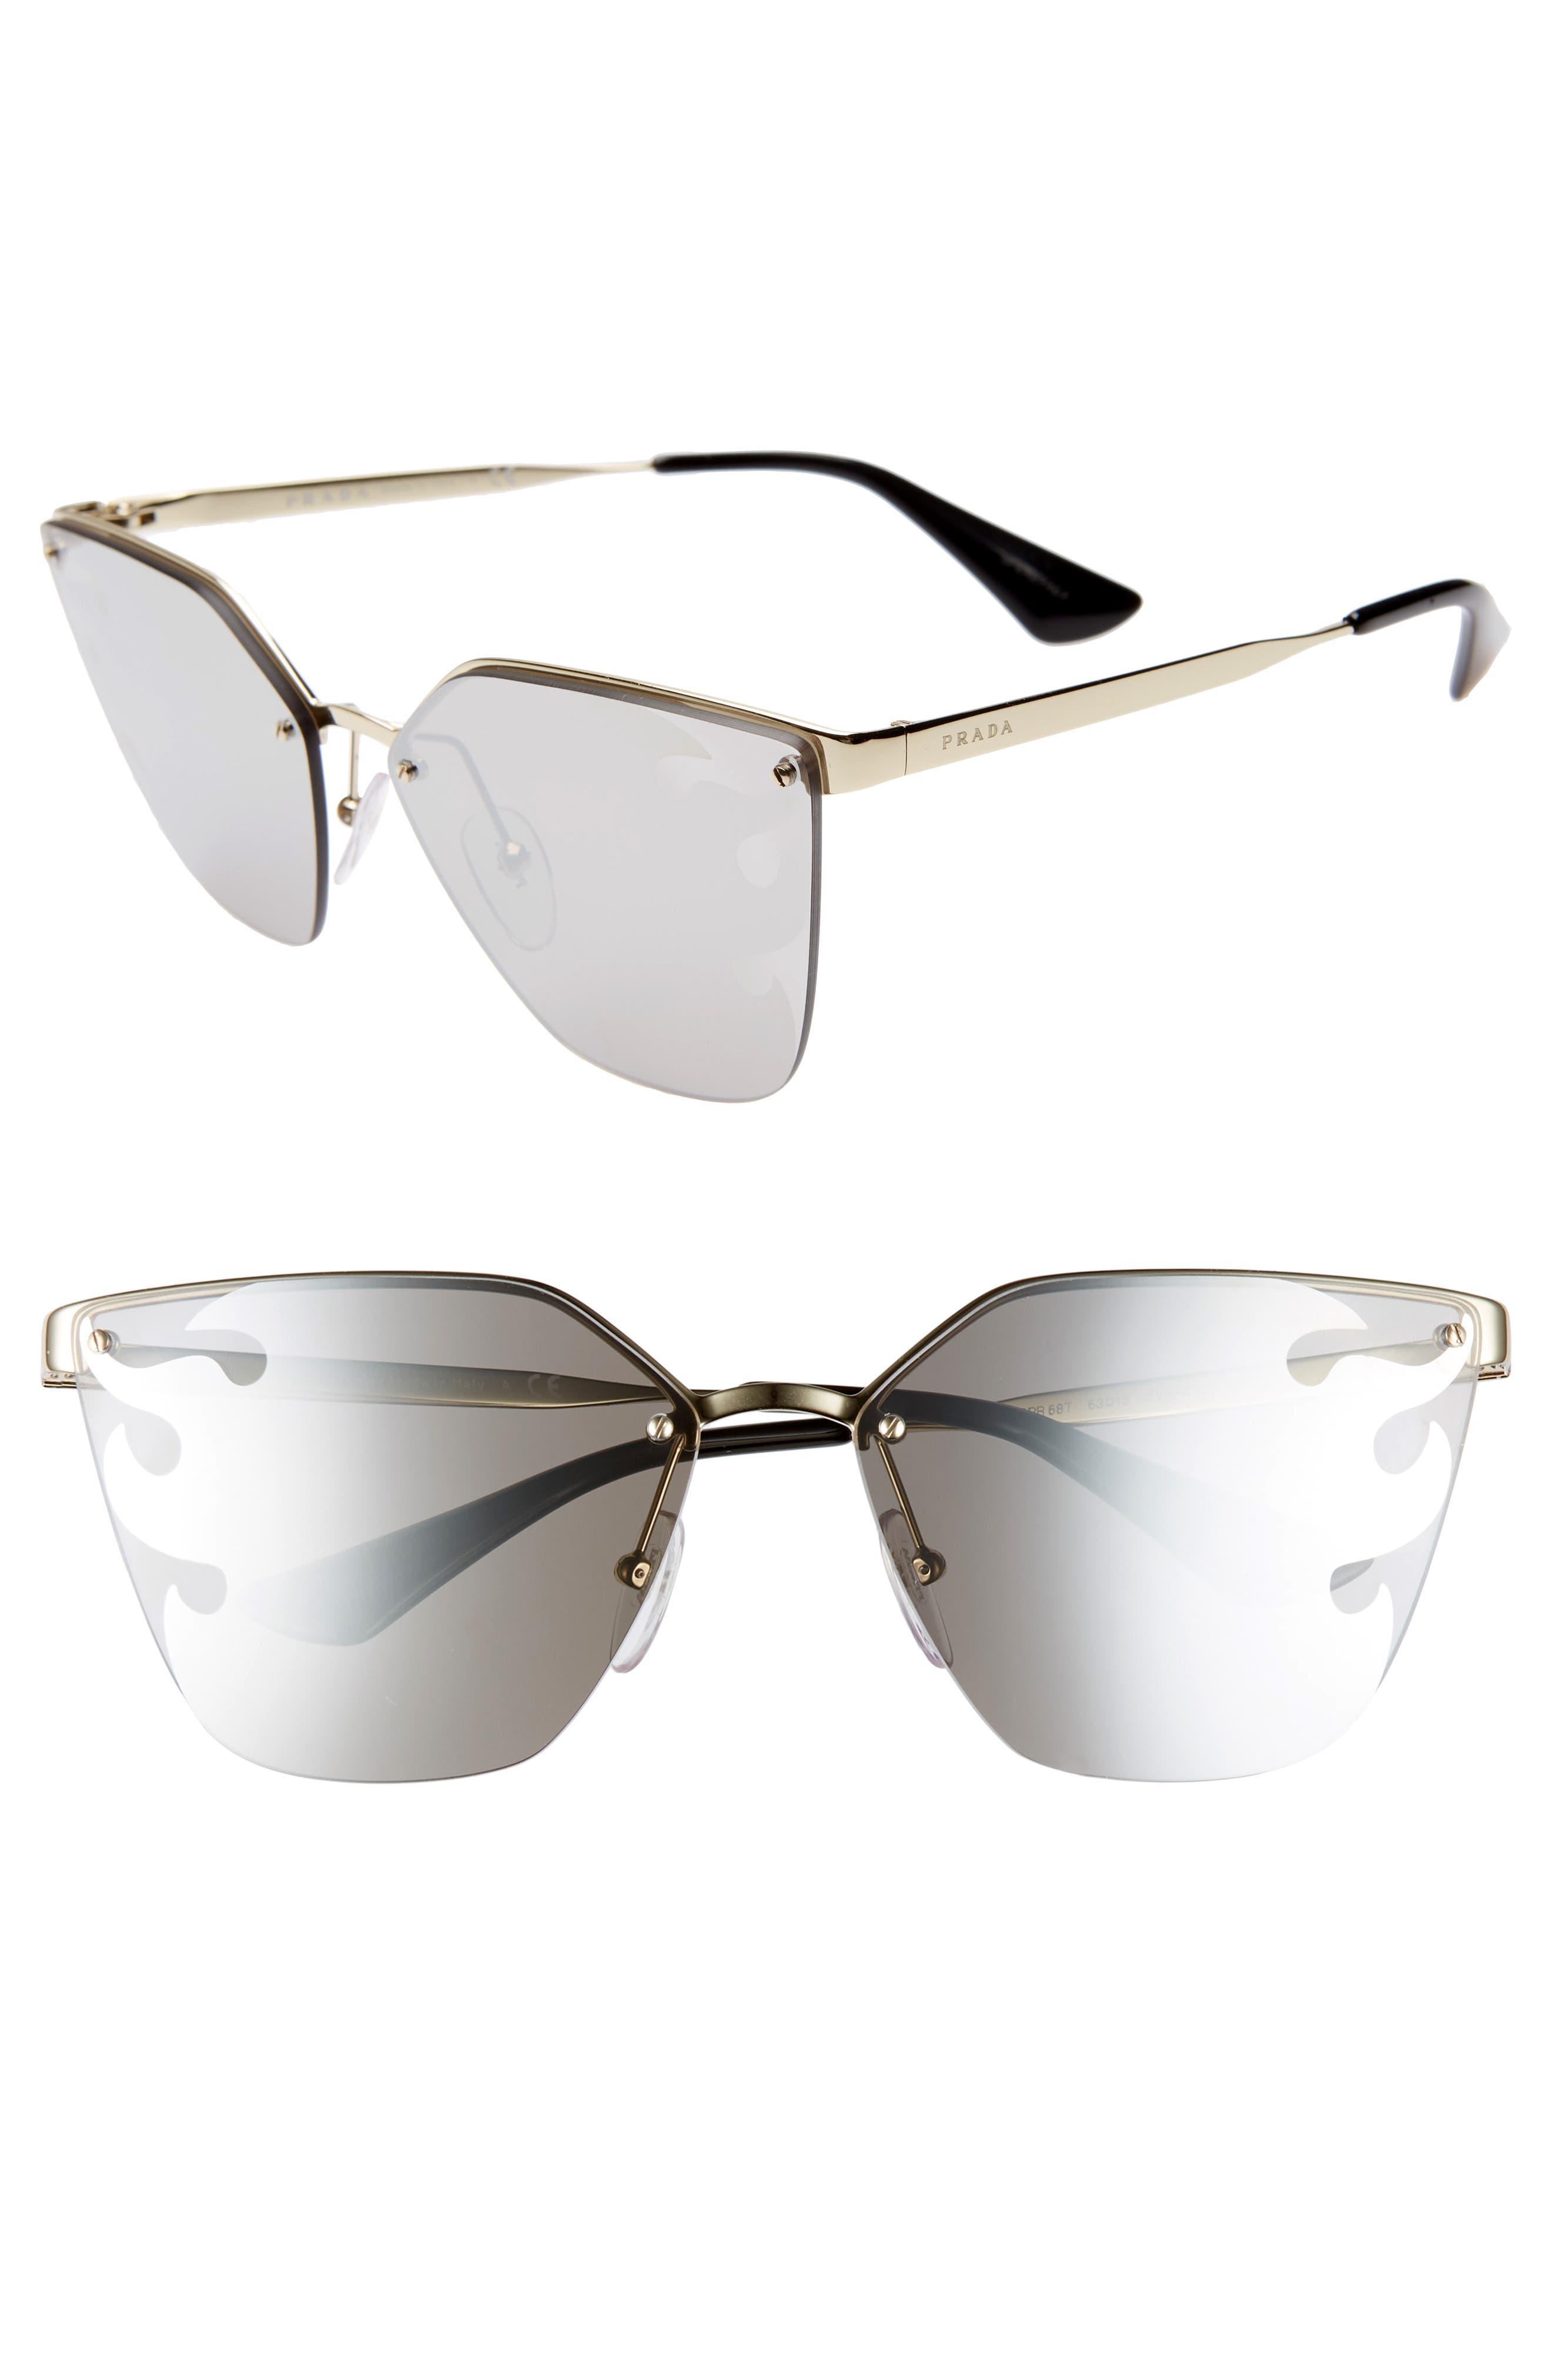 PRADA Cinéma 63mm Oversize Rimless Sunglasses, Main, color, GOLD/ GREY SILVER MIRROR